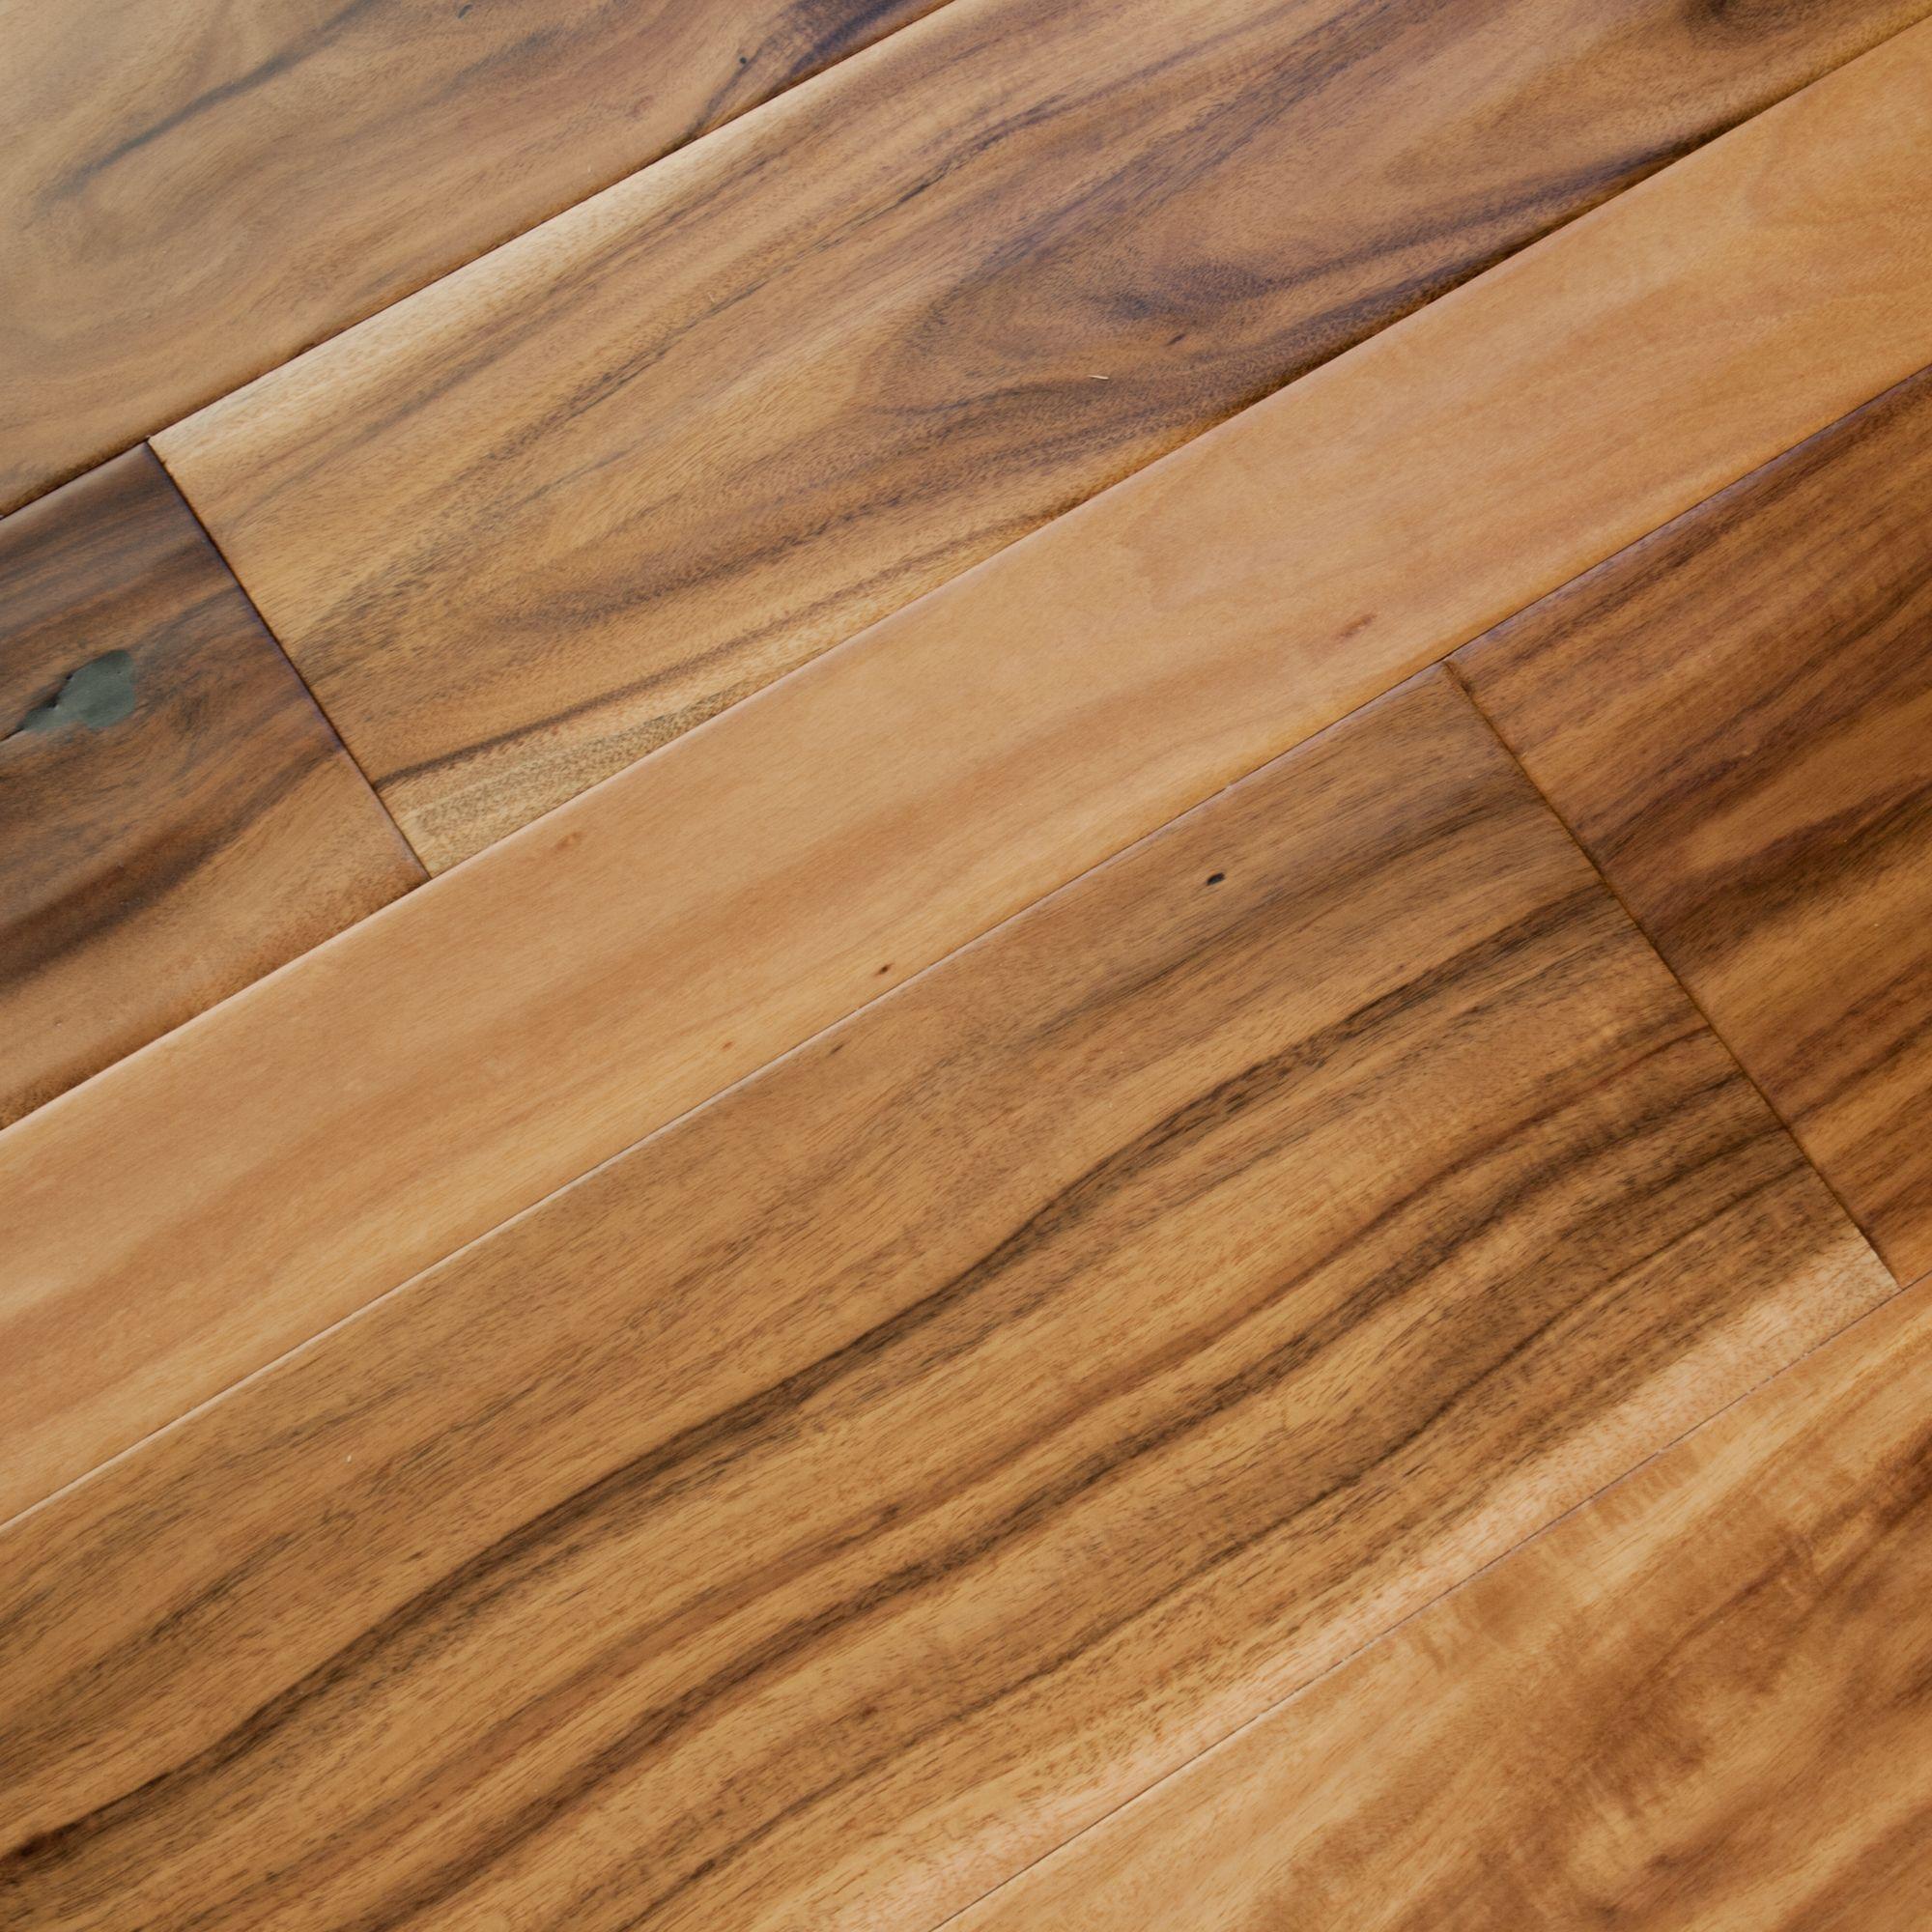 Artisan Acacia Natural Hand Scraped Engineered hardwood